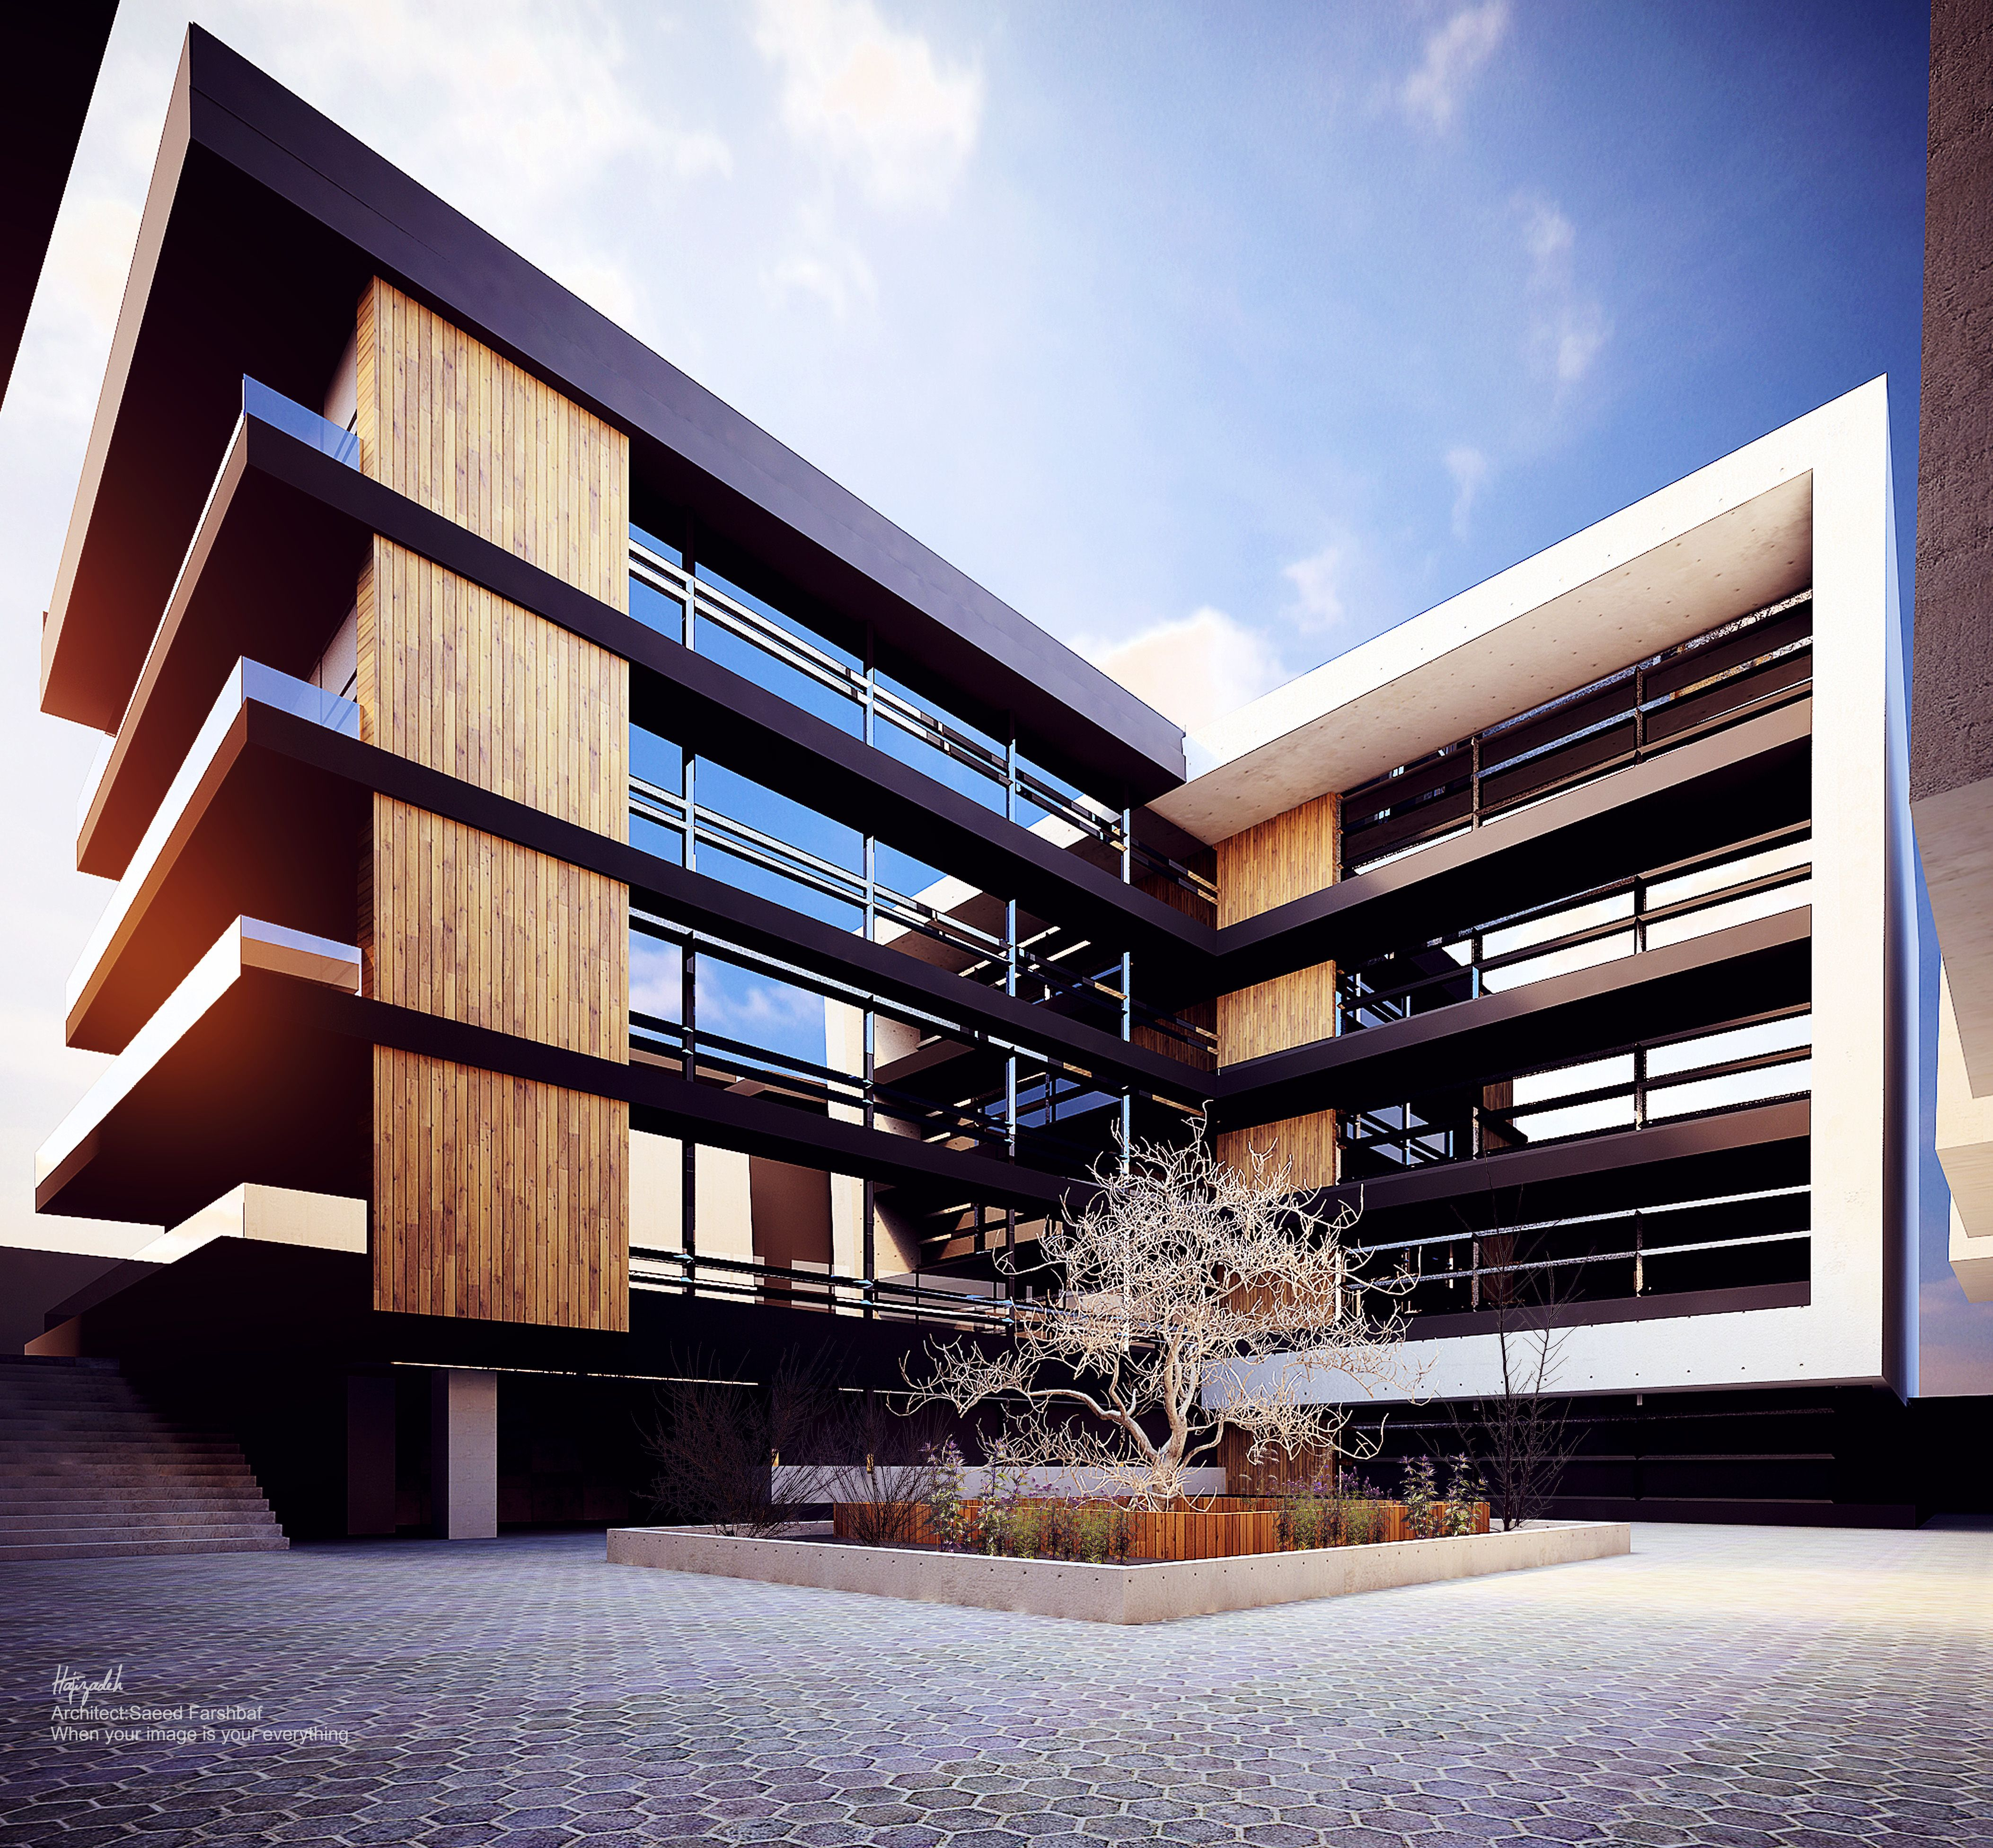 3ds Max Library ComplexArchitectsaeed Farshbaf 3D Designer MOhsen